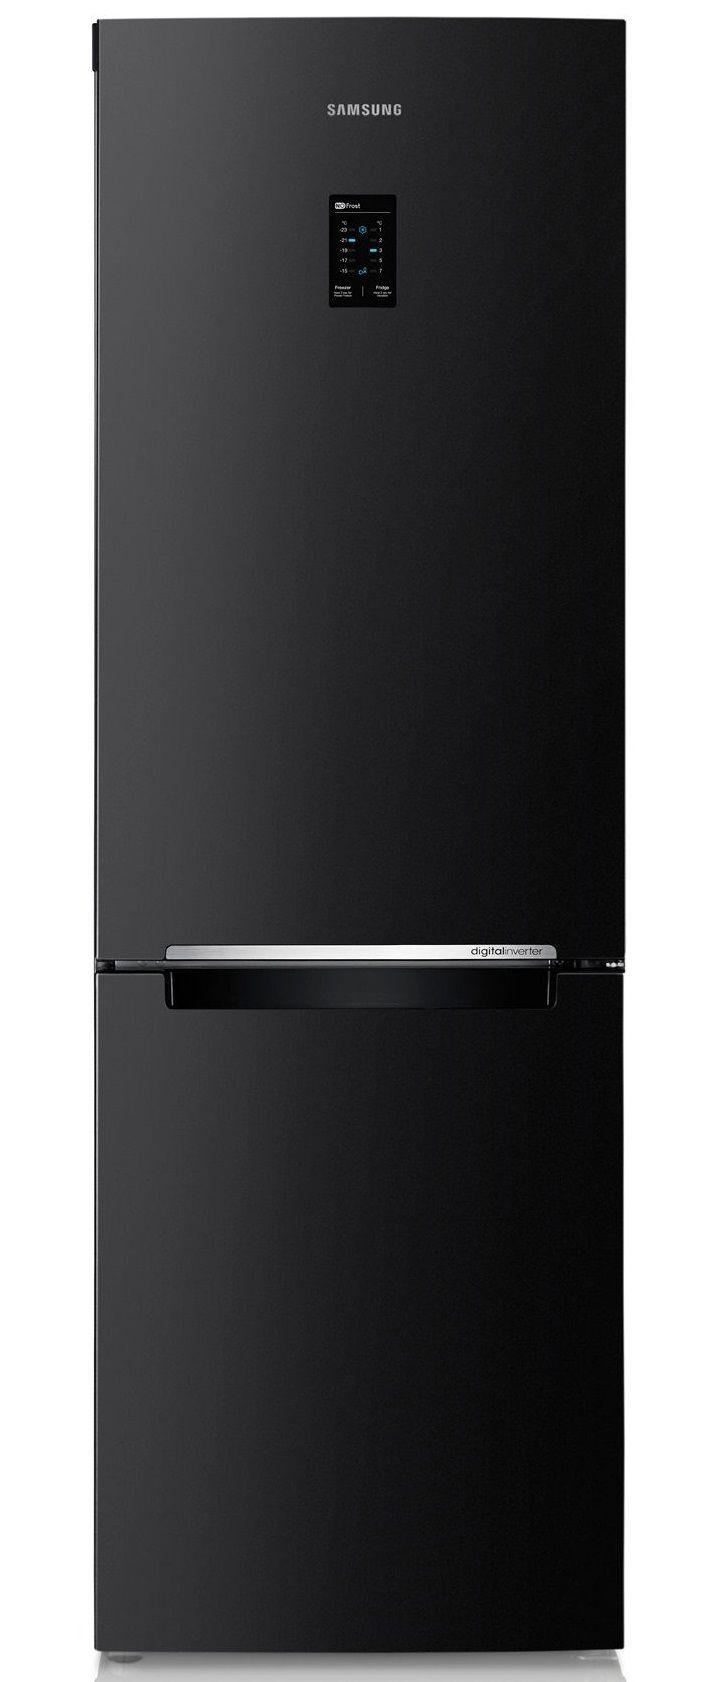 Combina frigorifica Samsung RB31FERNDB – Pastreaza alimentele mereu proaspete!  viewnews.ro